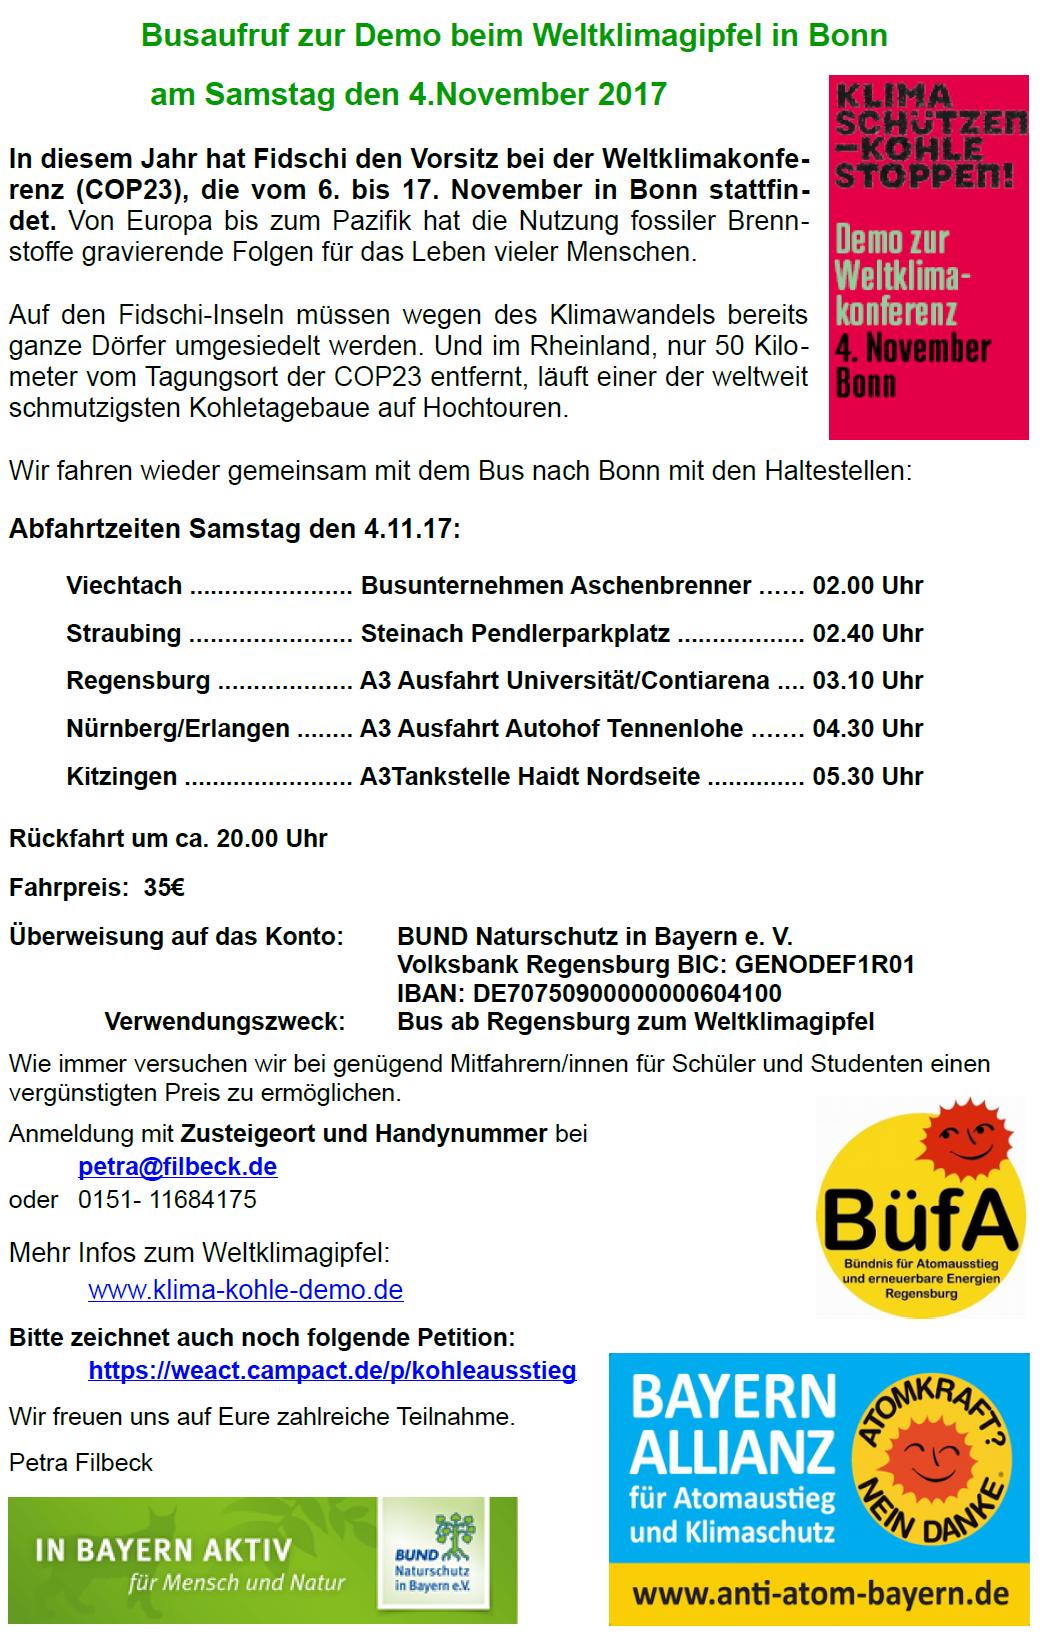 demonstration zur weltklimakonferenz 12 uhr bonn m nsterplatz bayern allianz f r. Black Bedroom Furniture Sets. Home Design Ideas